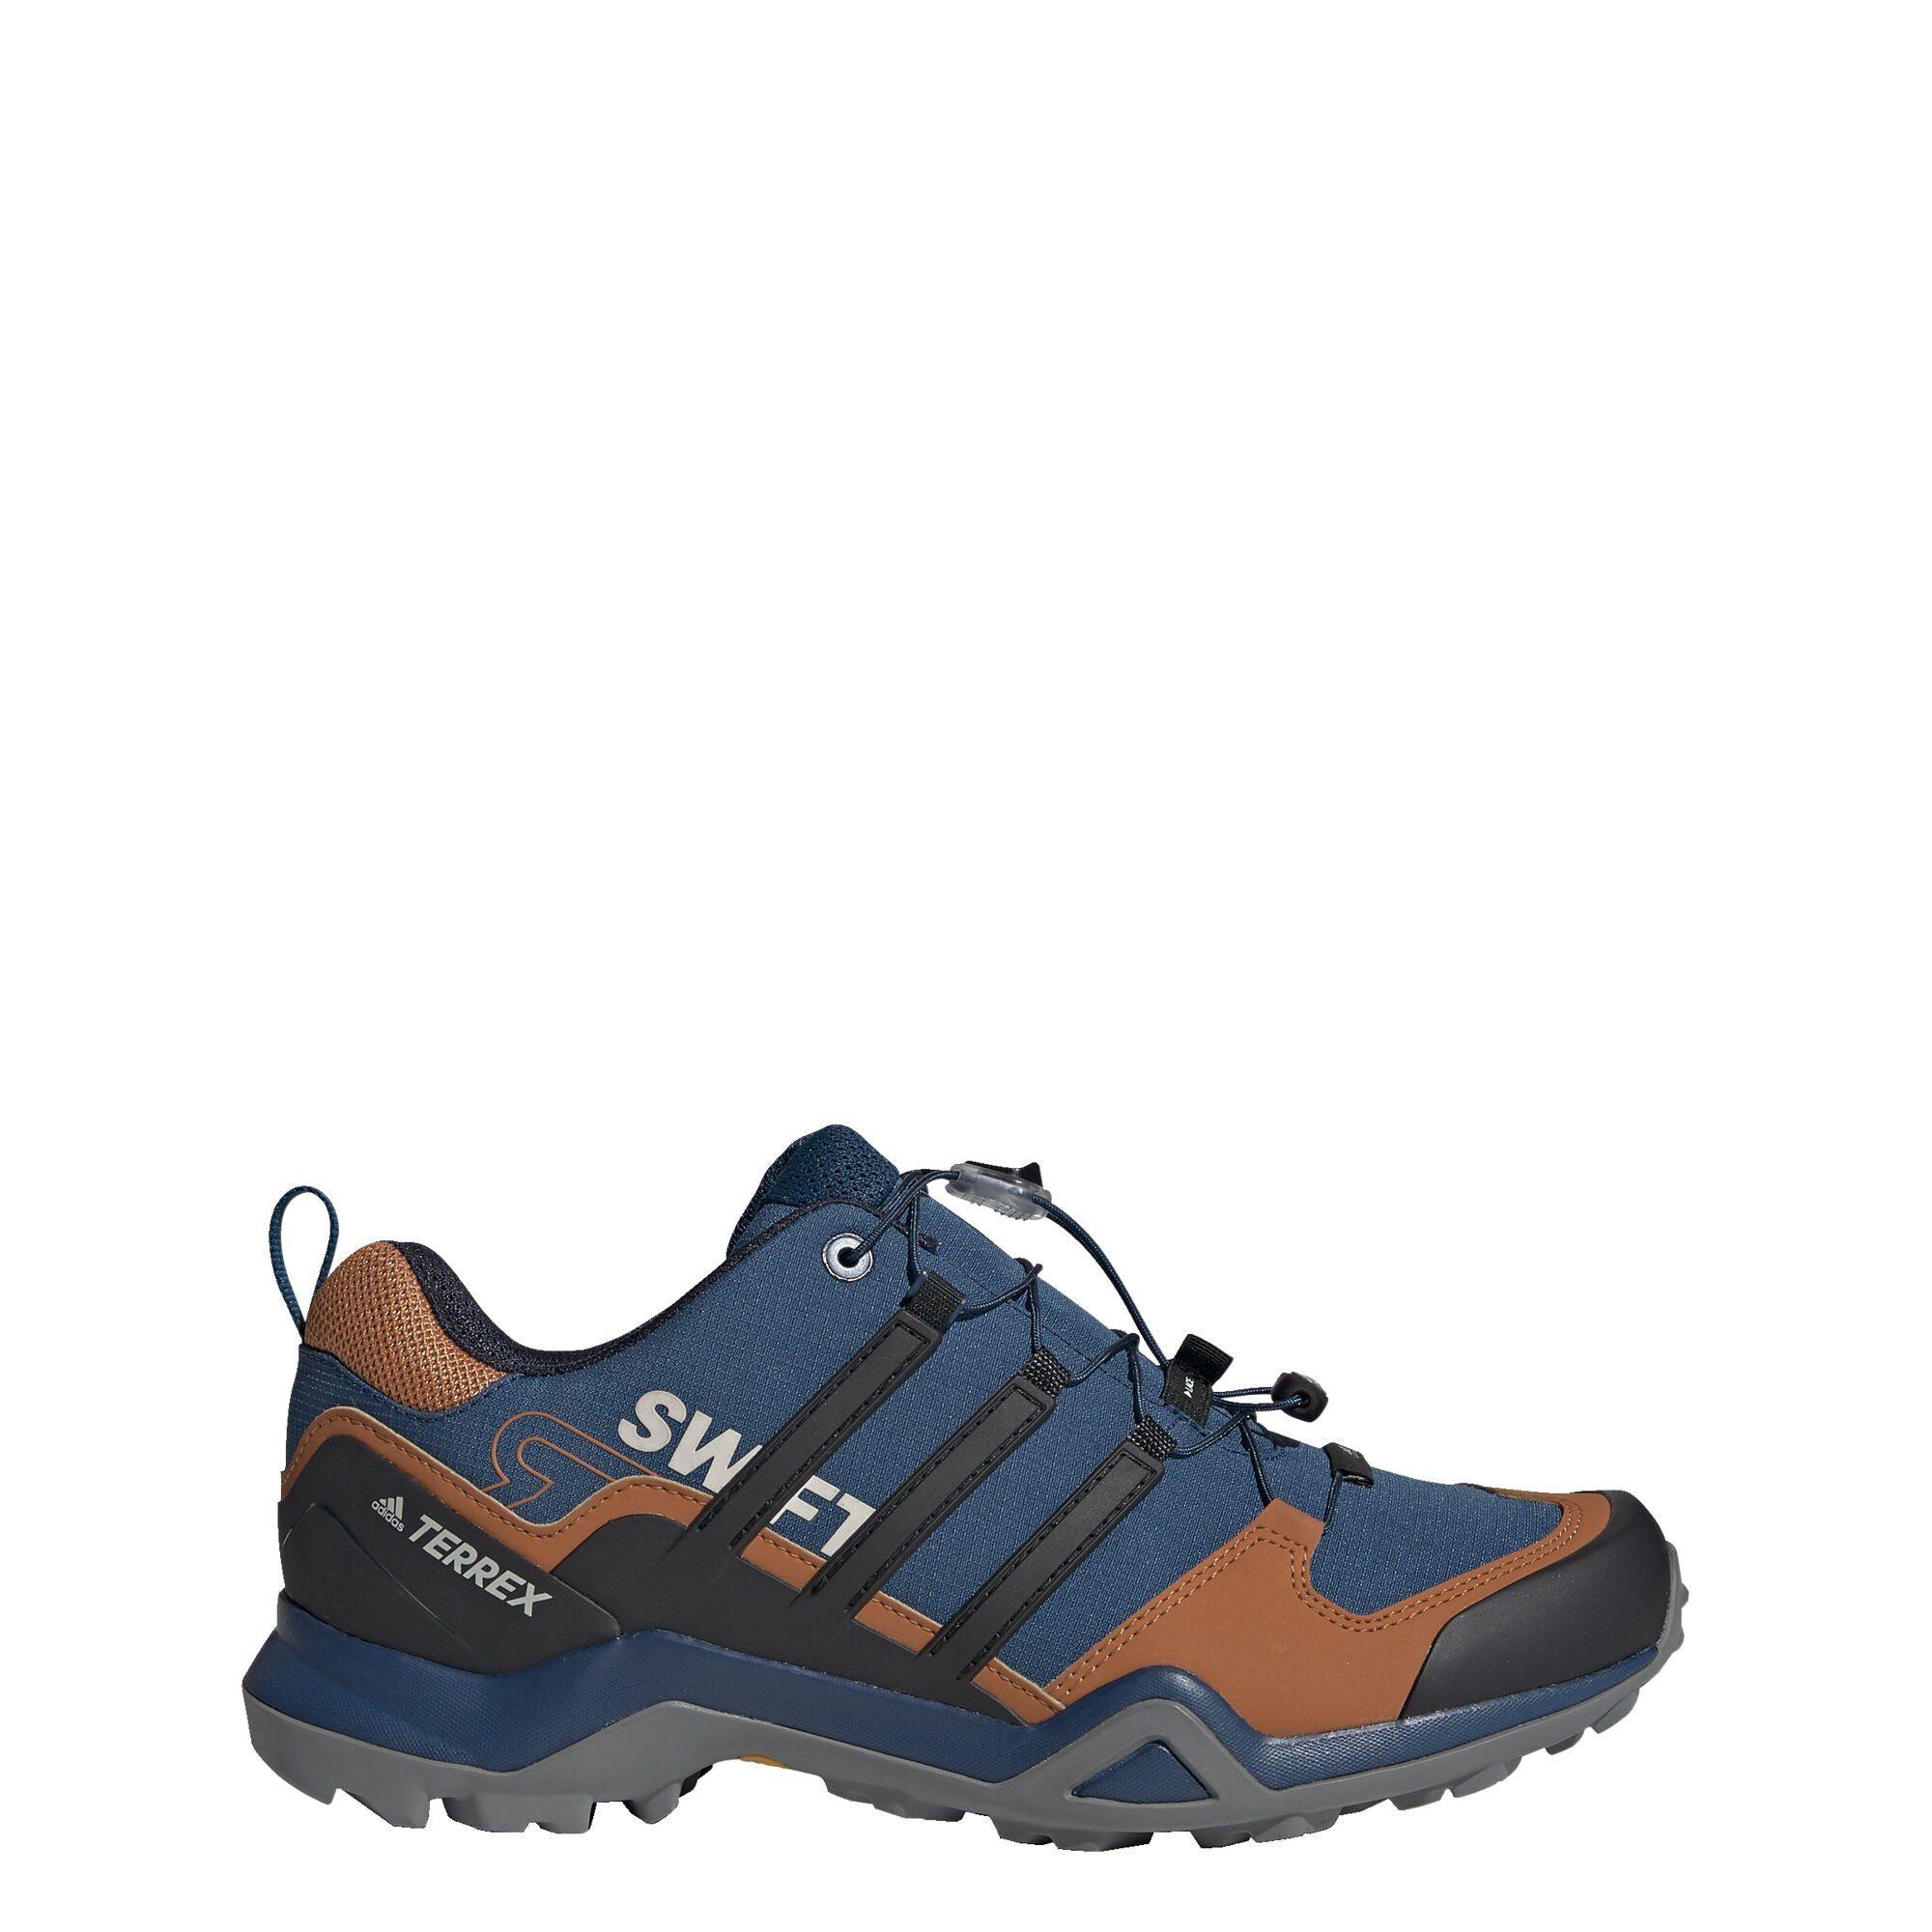 adidas Performance »TERREX Swift R2 Schuh« Outdoorschuh Outdoorschuh online kaufen | OTTO